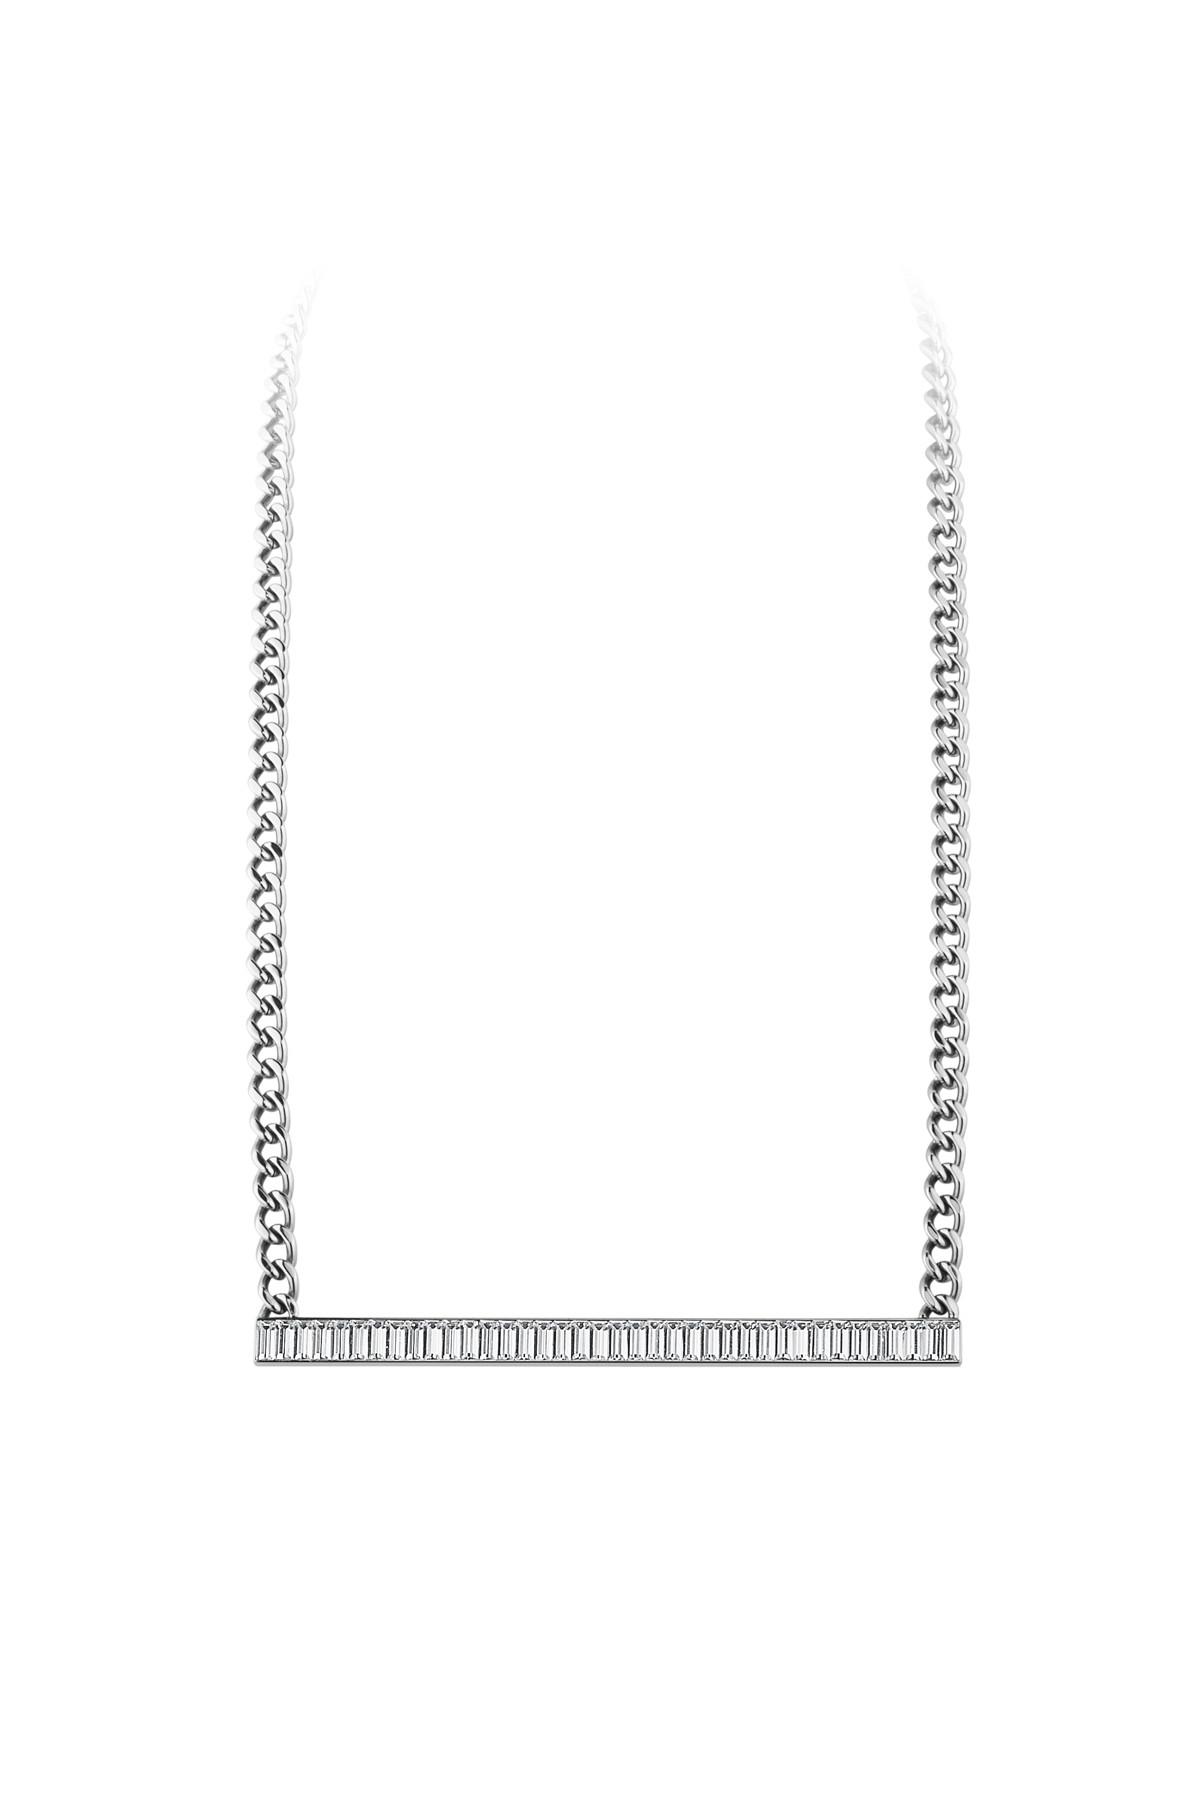 Image of   DYRBERG/KERN ALYSSA HALSKÆDE 339590 (Silver, Crystal, ONESIZE)